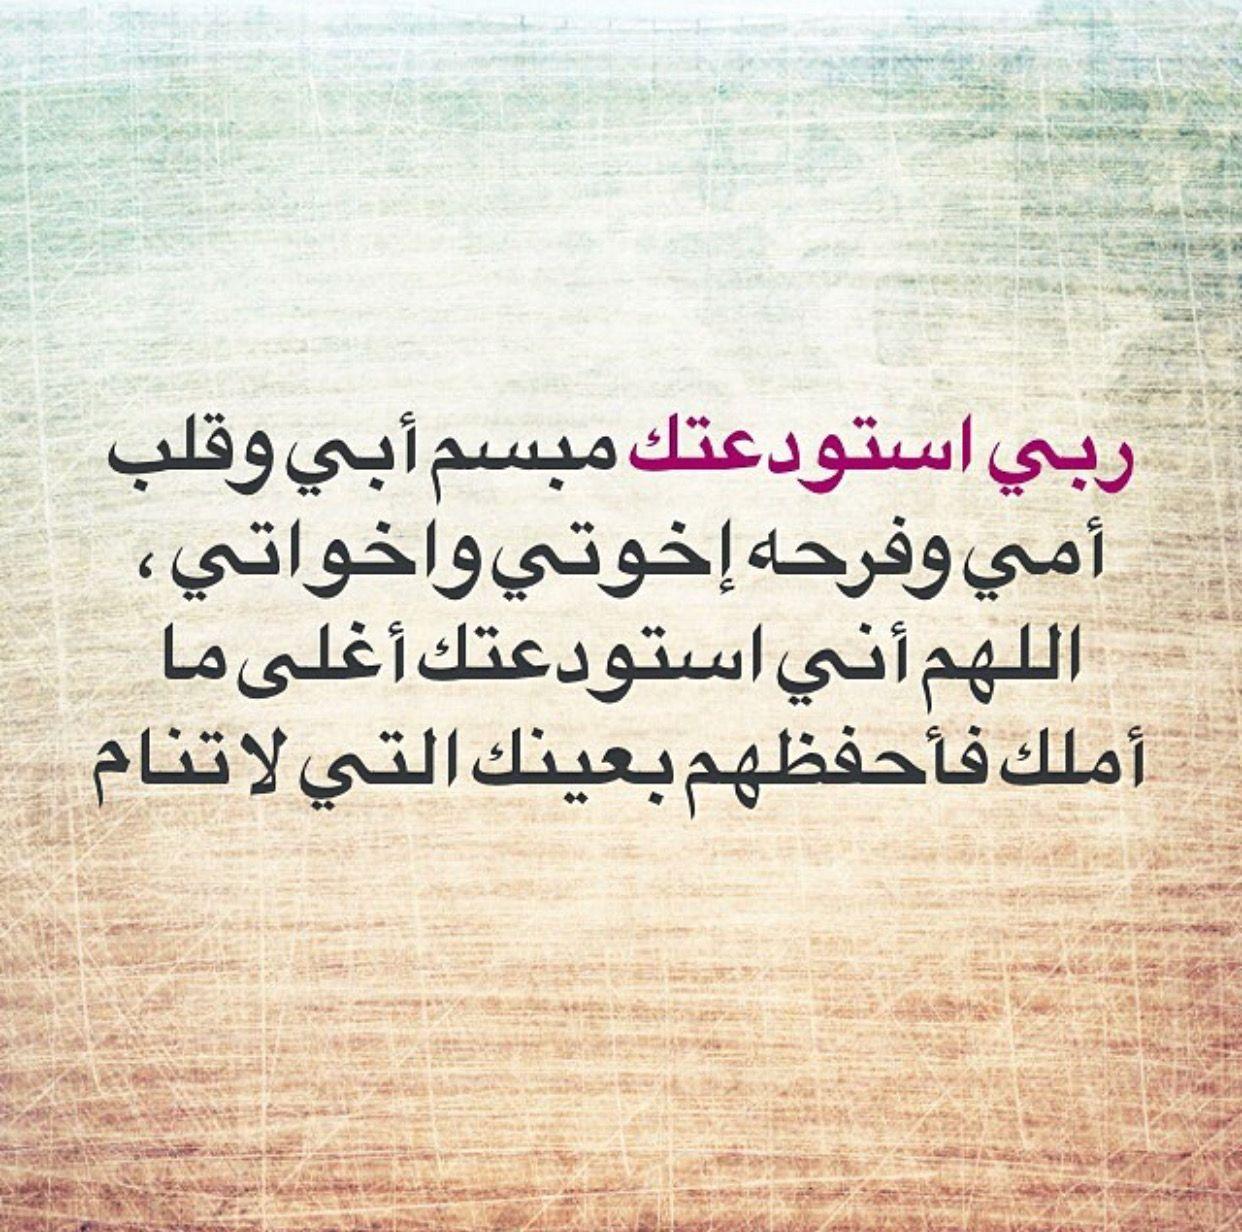 يارب اني احفظ لي من في قلبي Quotes Words Qoutes